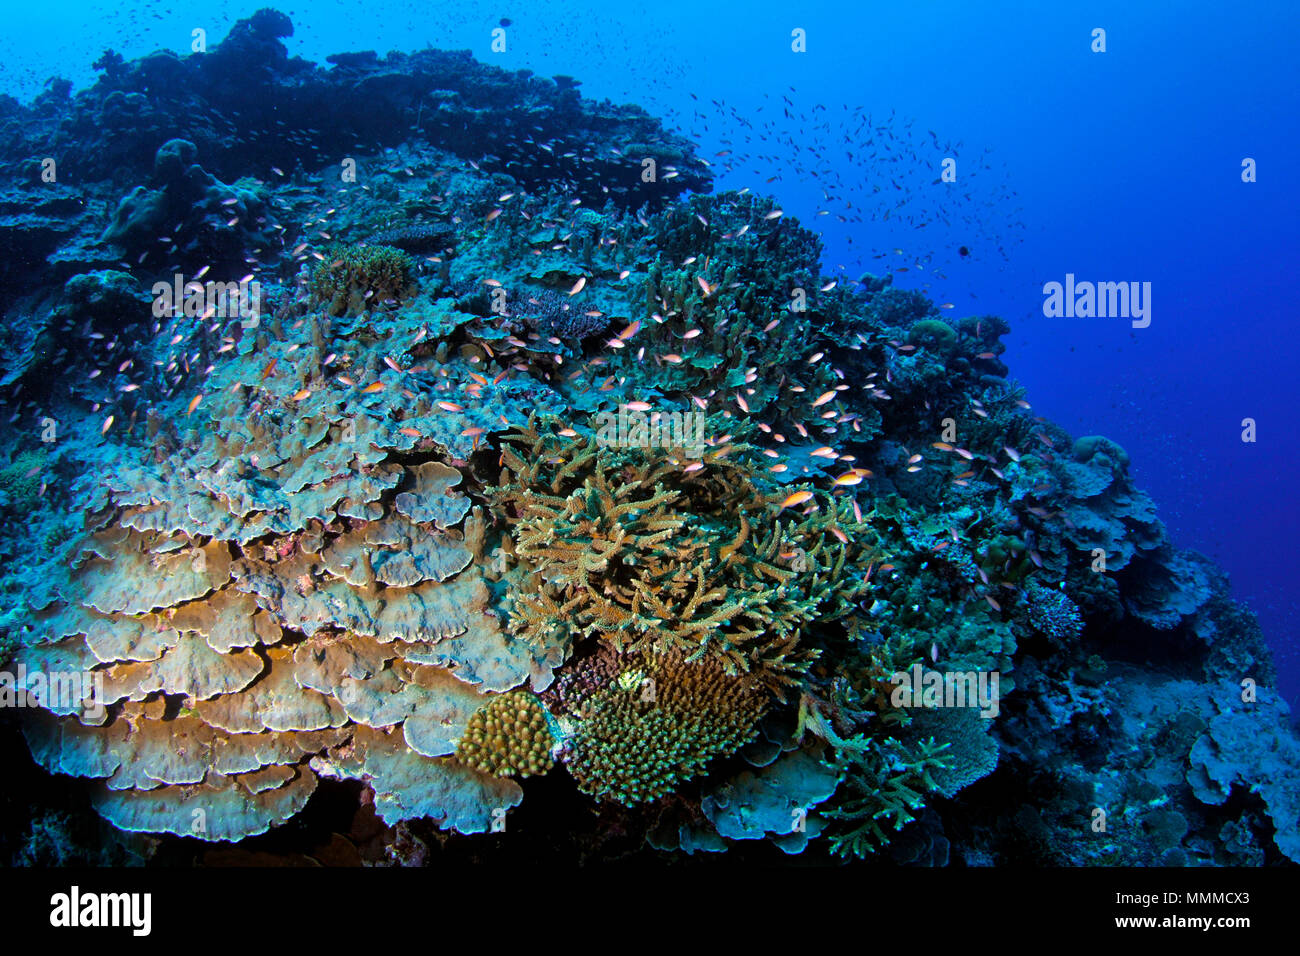 Coral reef scene underwater, Wallis Island, Wallis & Futuna, South Pacific - Stock Image